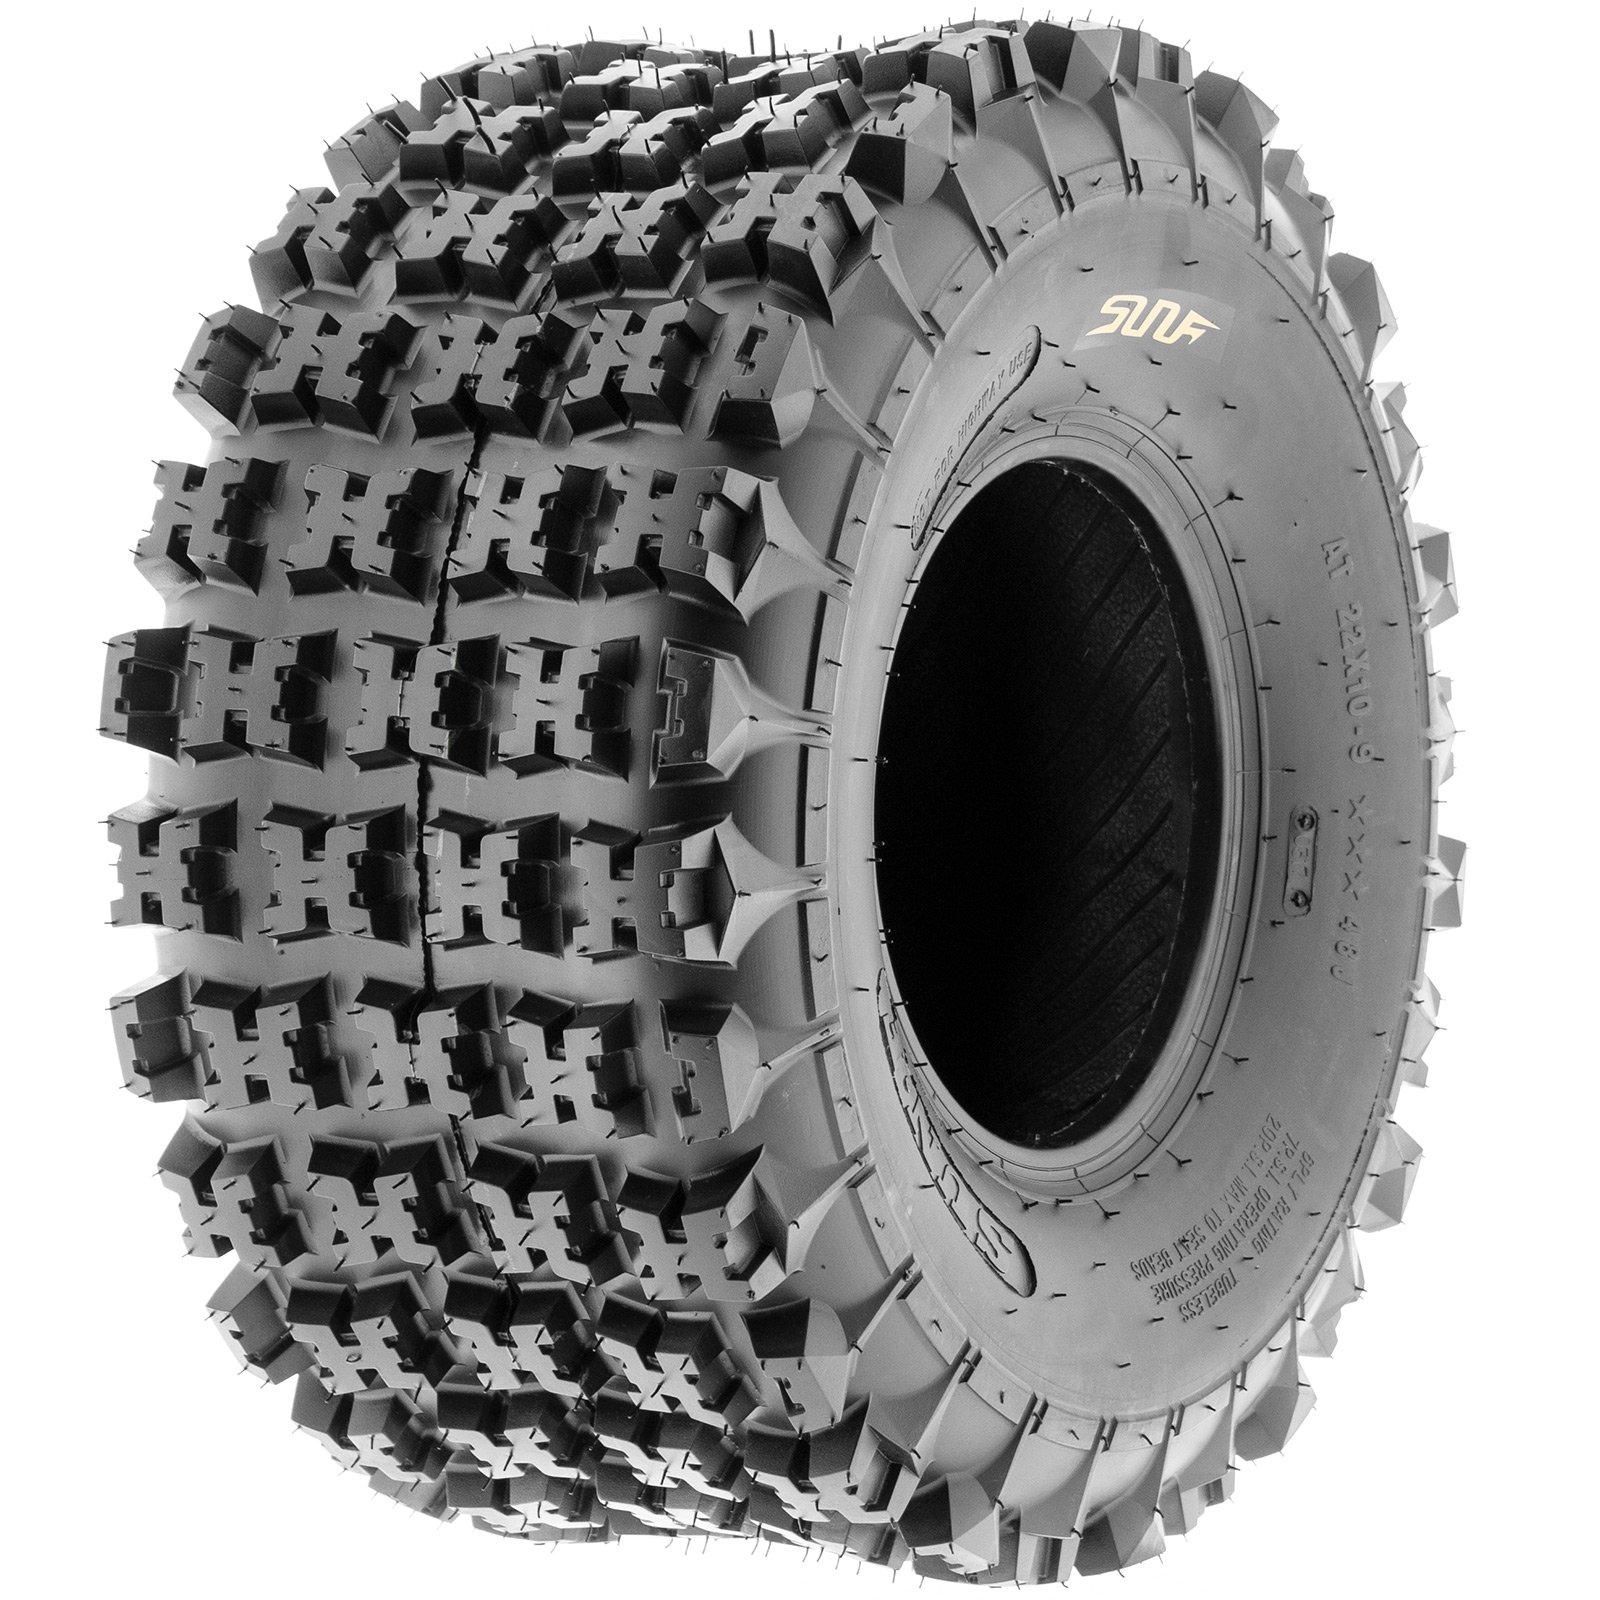 SunF A027 XC-Sport ATV/UTV Knobby Tire 22x10-9, 6 PR, Tubeless